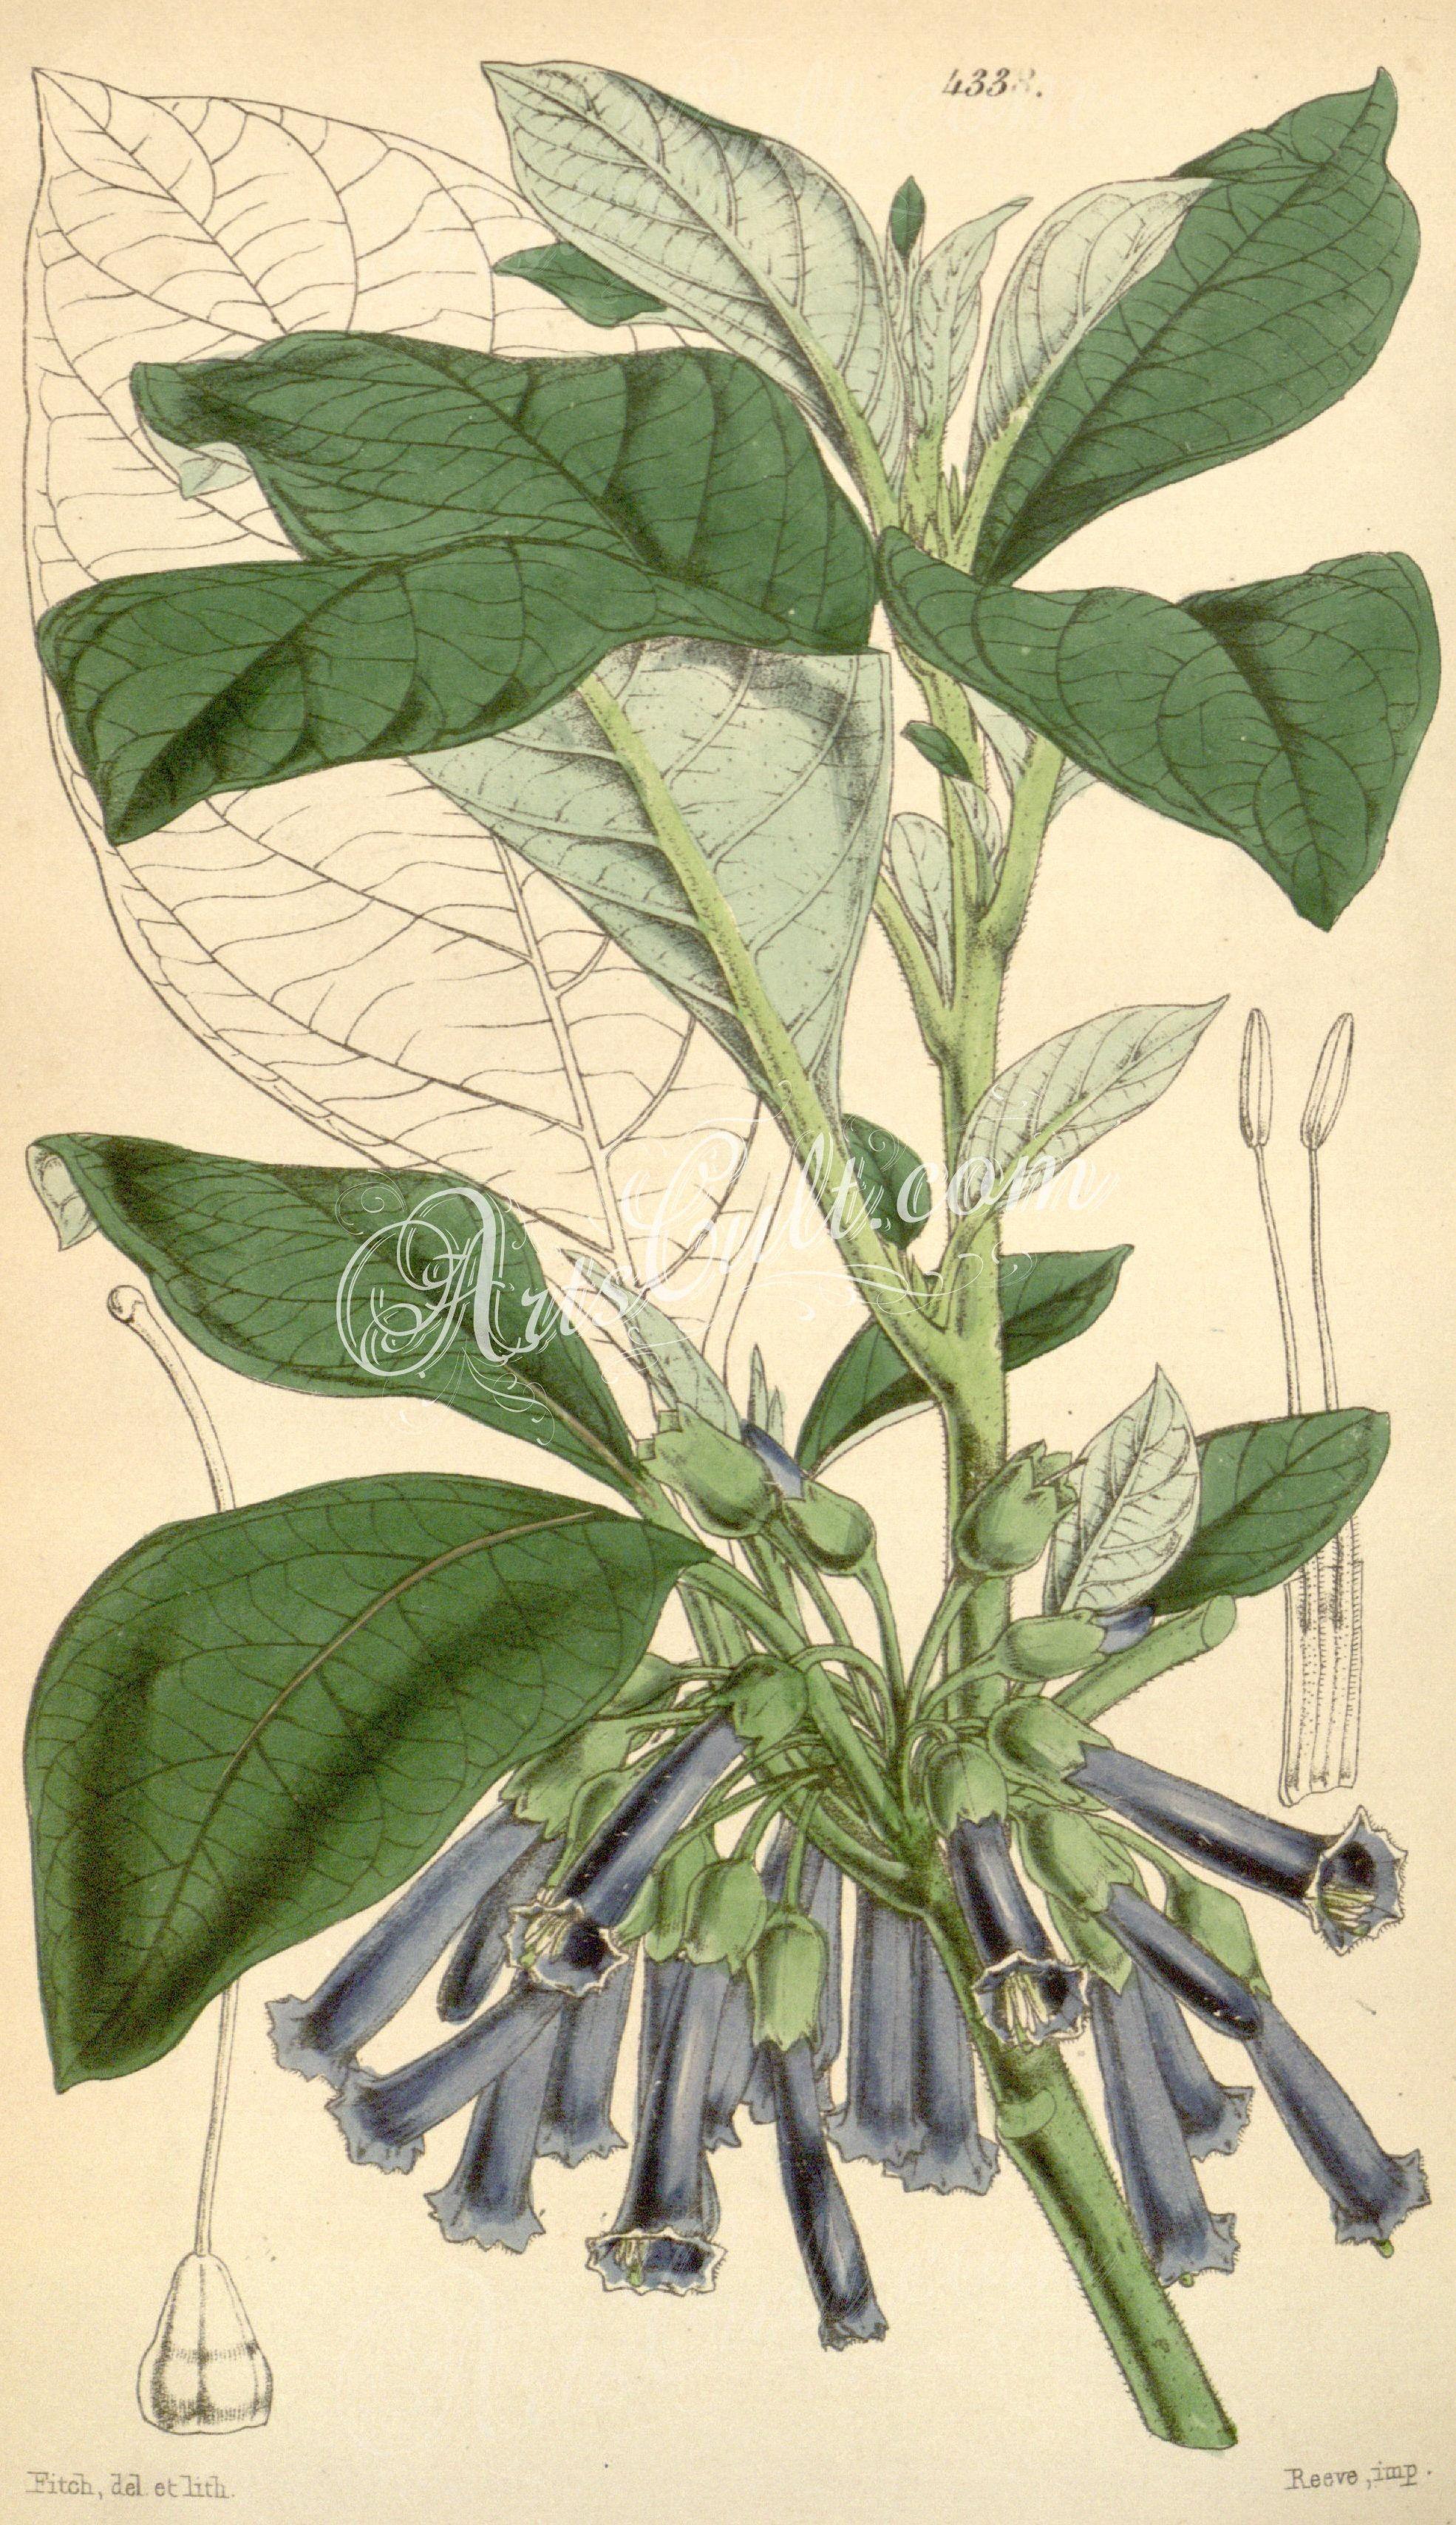 4338-chaenestes lanceolata, Lanceolate-leaved Chaenestes      ...